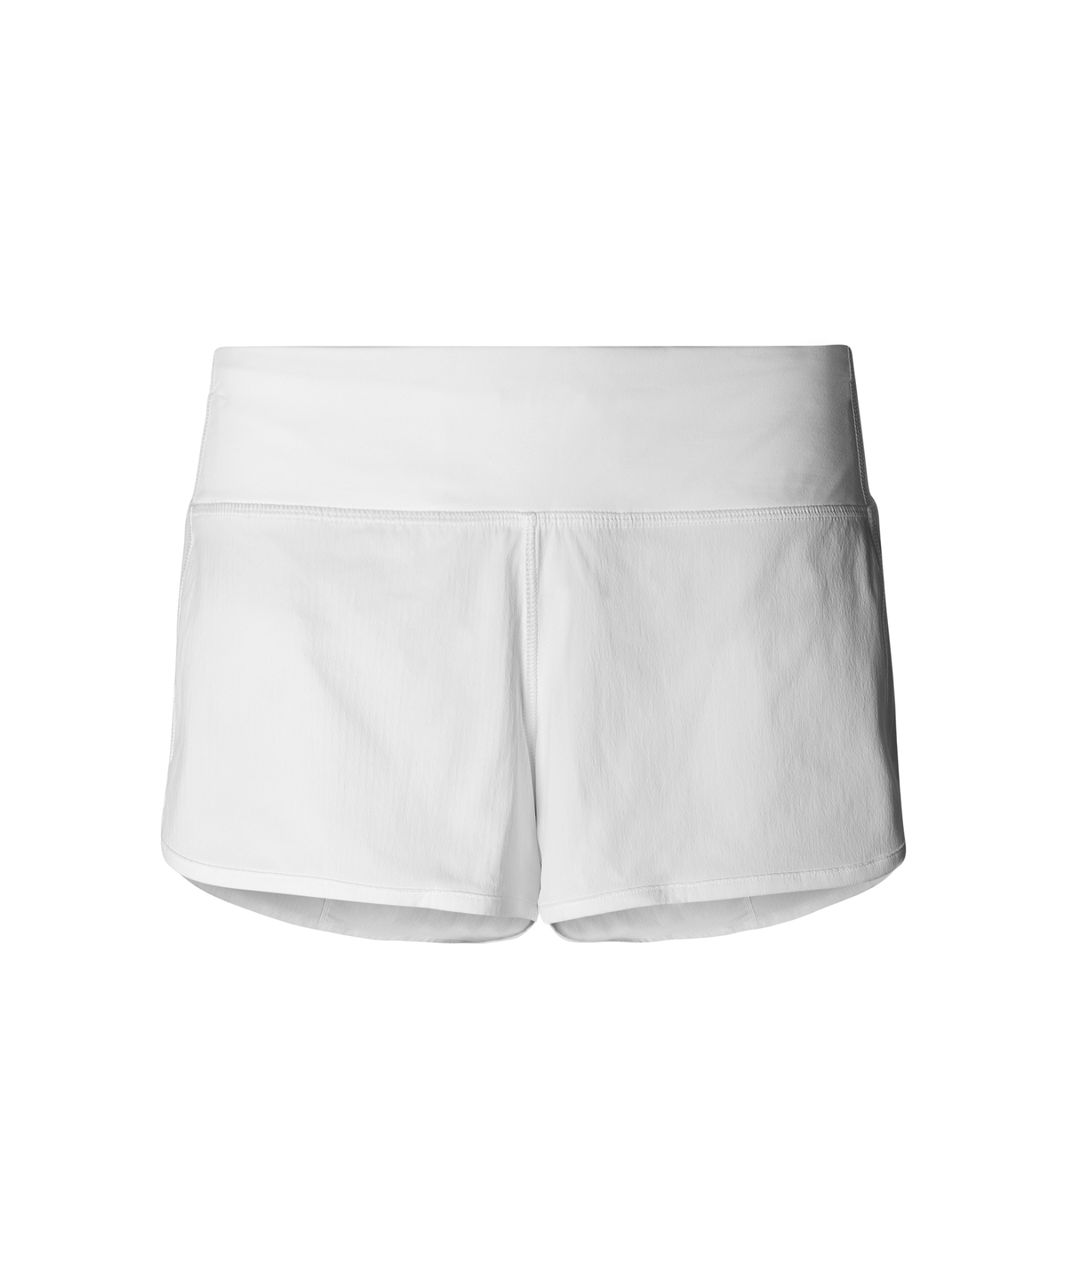 "Lululemon Speed Short *2-way Stretch 2.5"" - White"